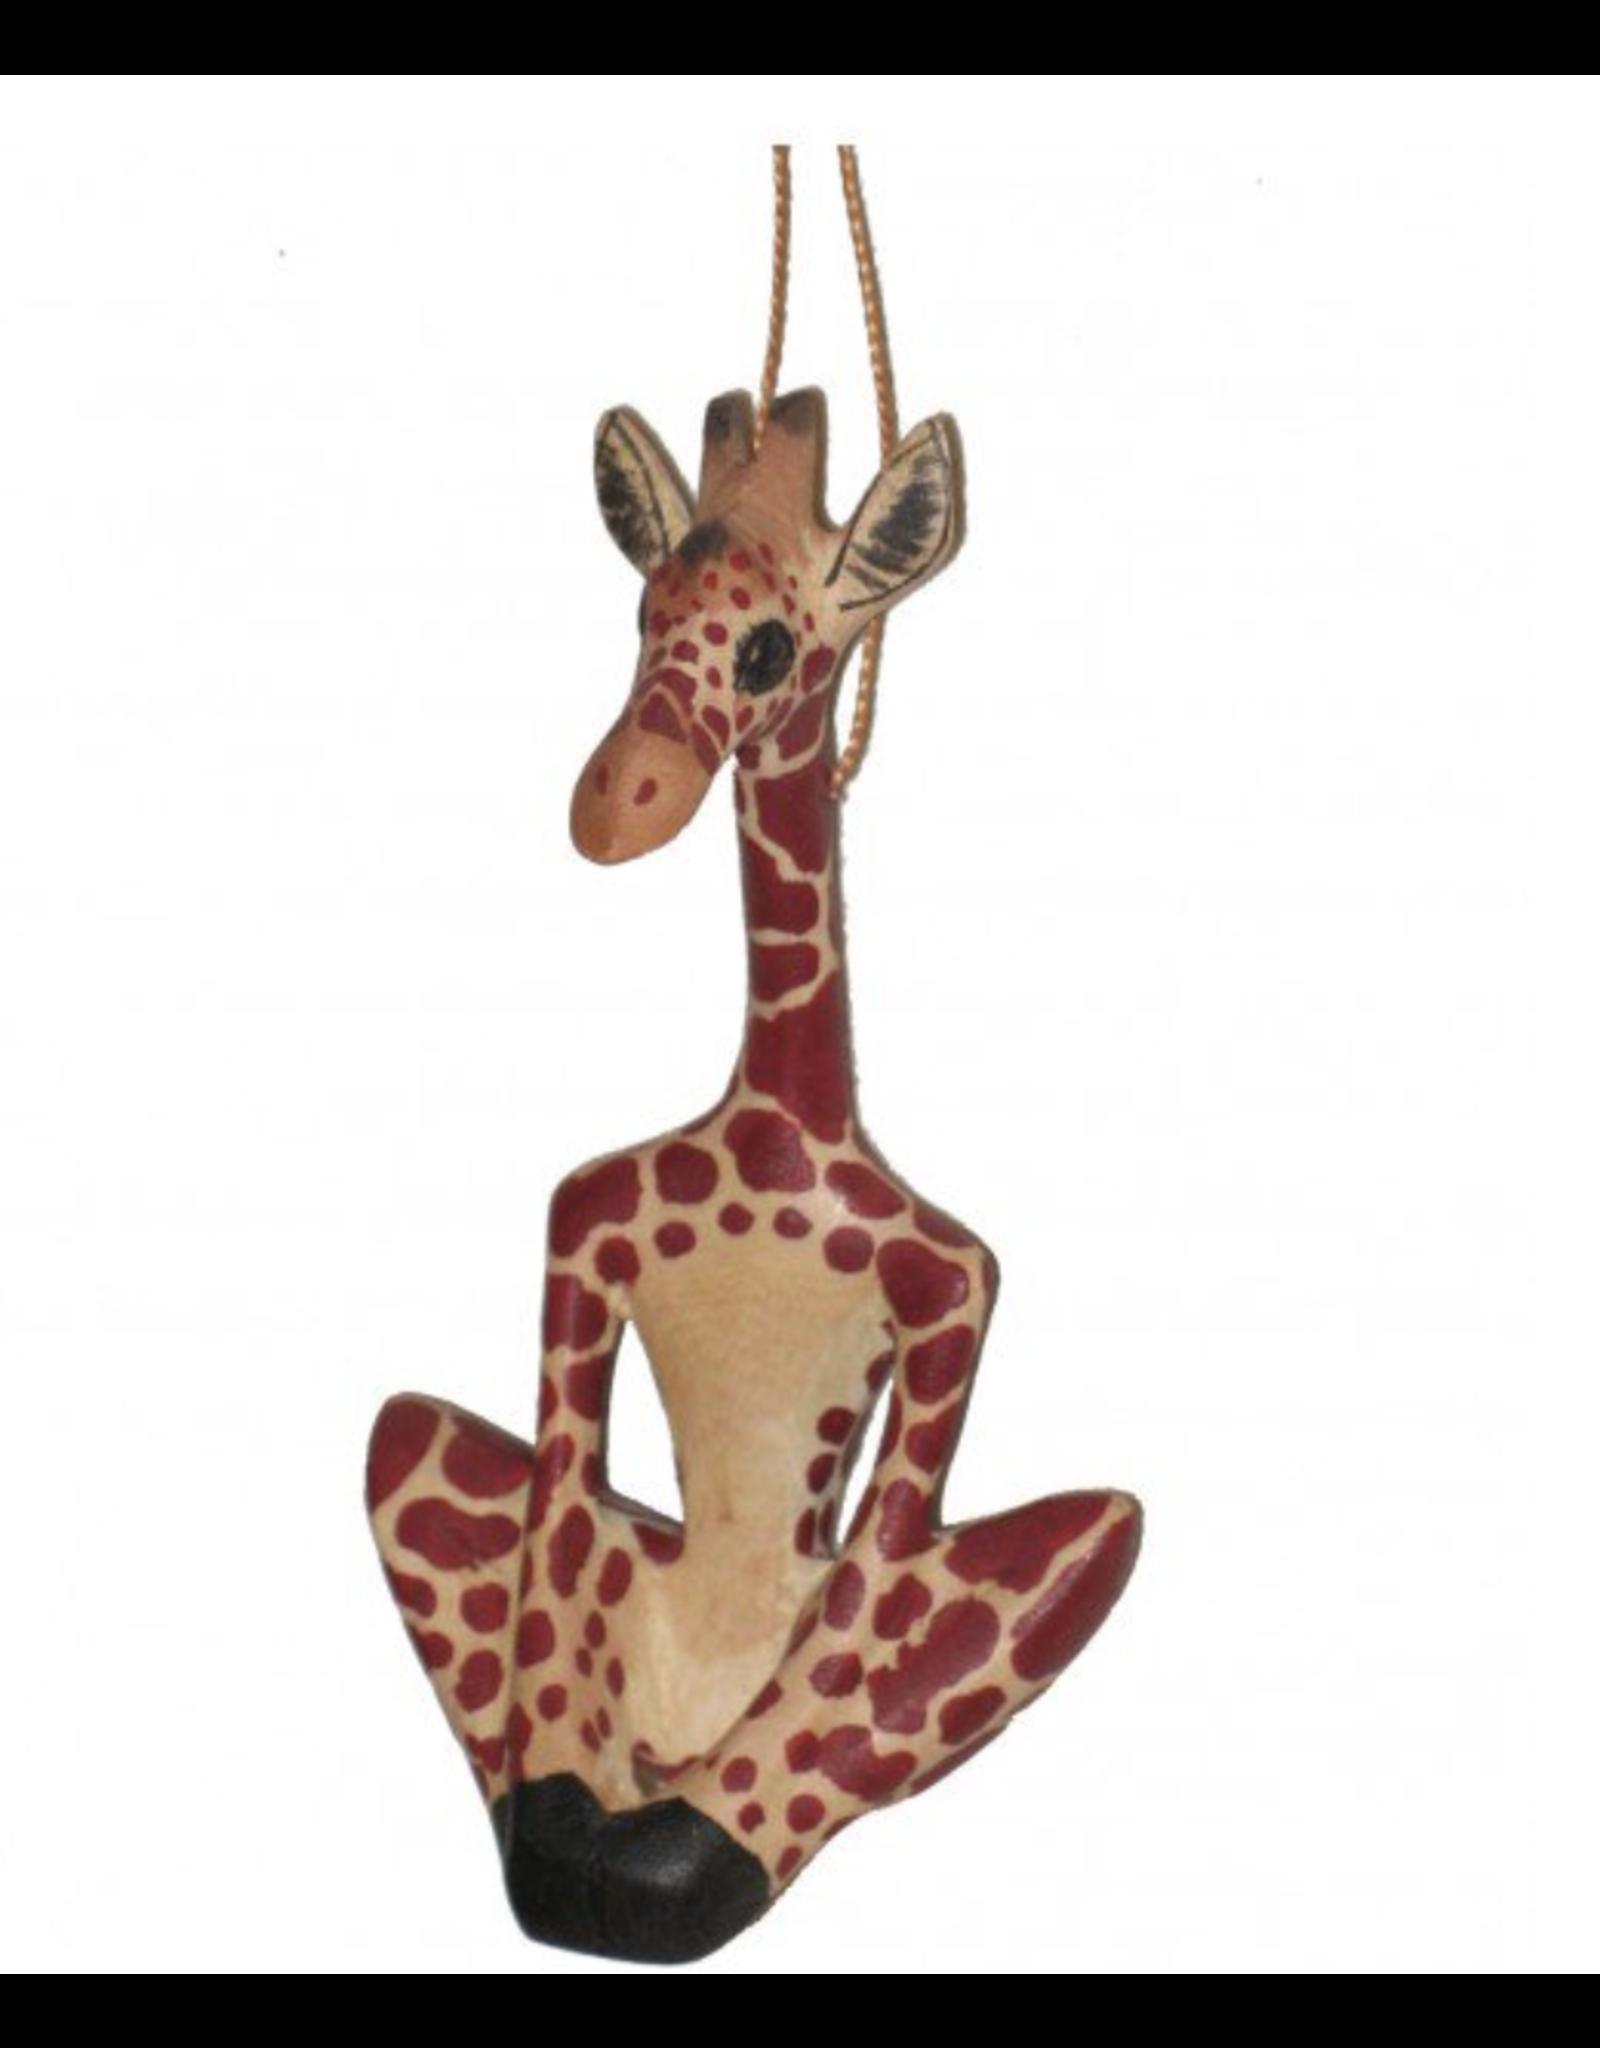 Yoga Giraffe Ornament, Kenya